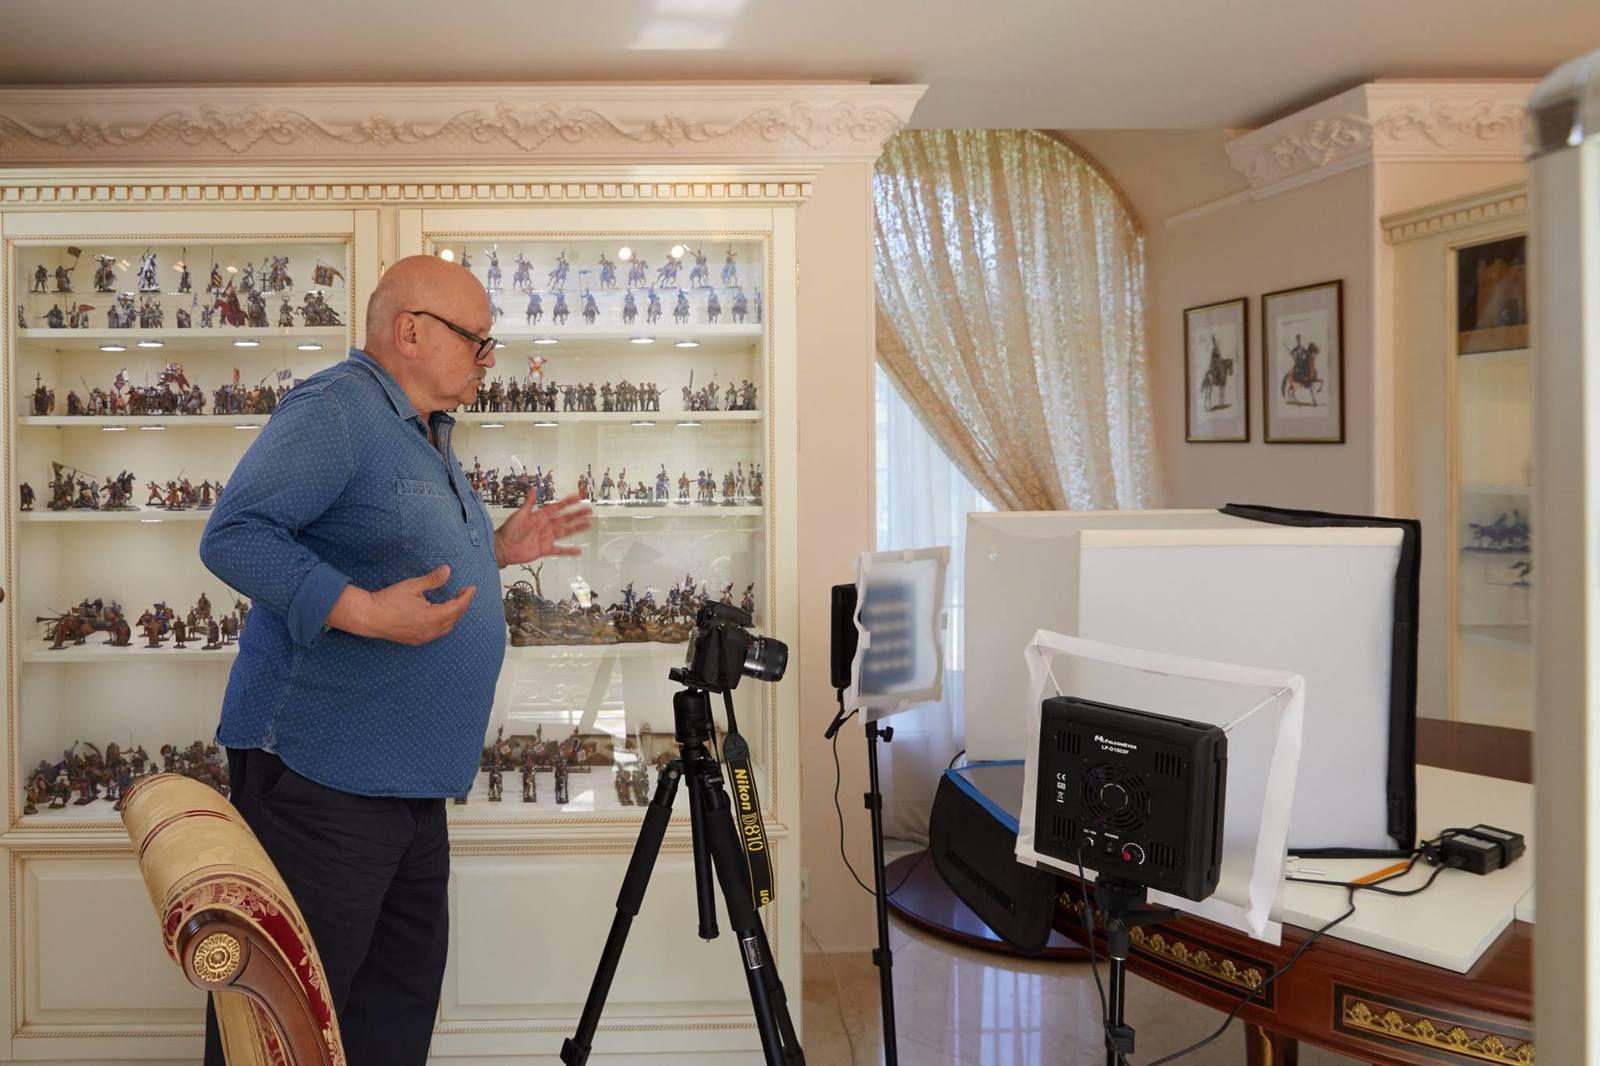 Mikhail Kochetkov / COLLECTIONNEUR DE FIGURINES / MOSCOU